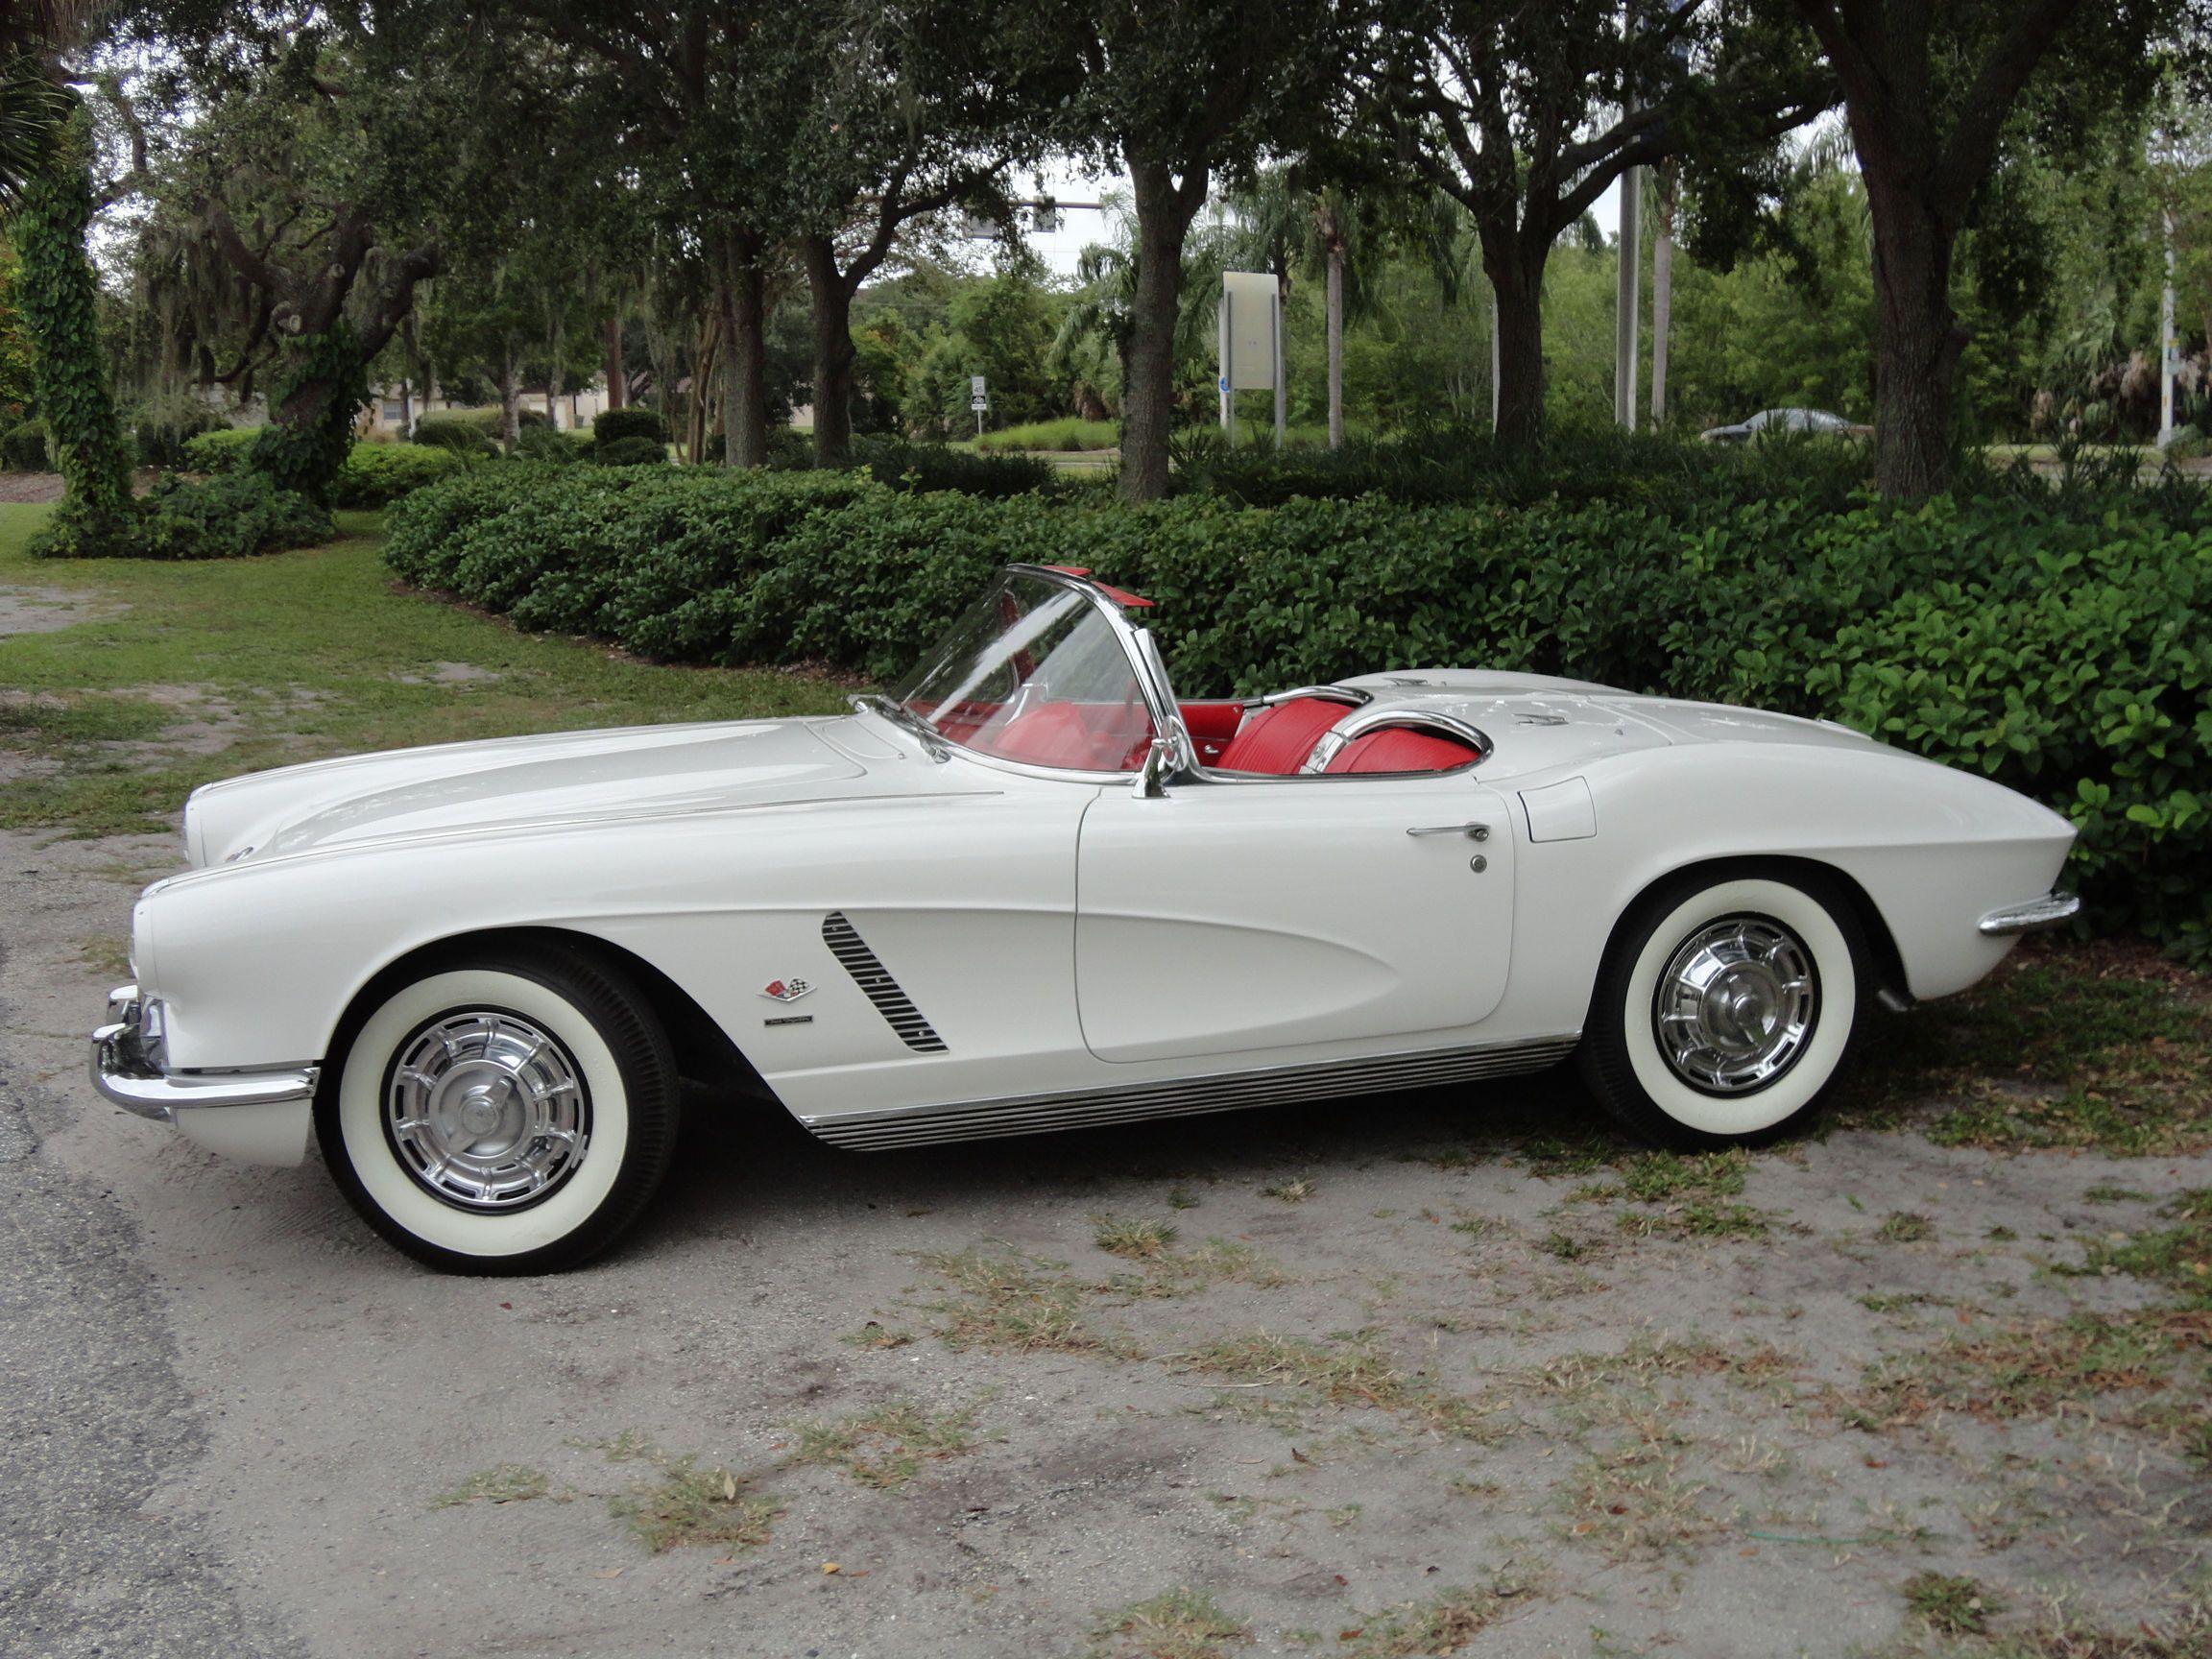 Kelebihan Kekurangan Corvette 1962 Murah Berkualitas